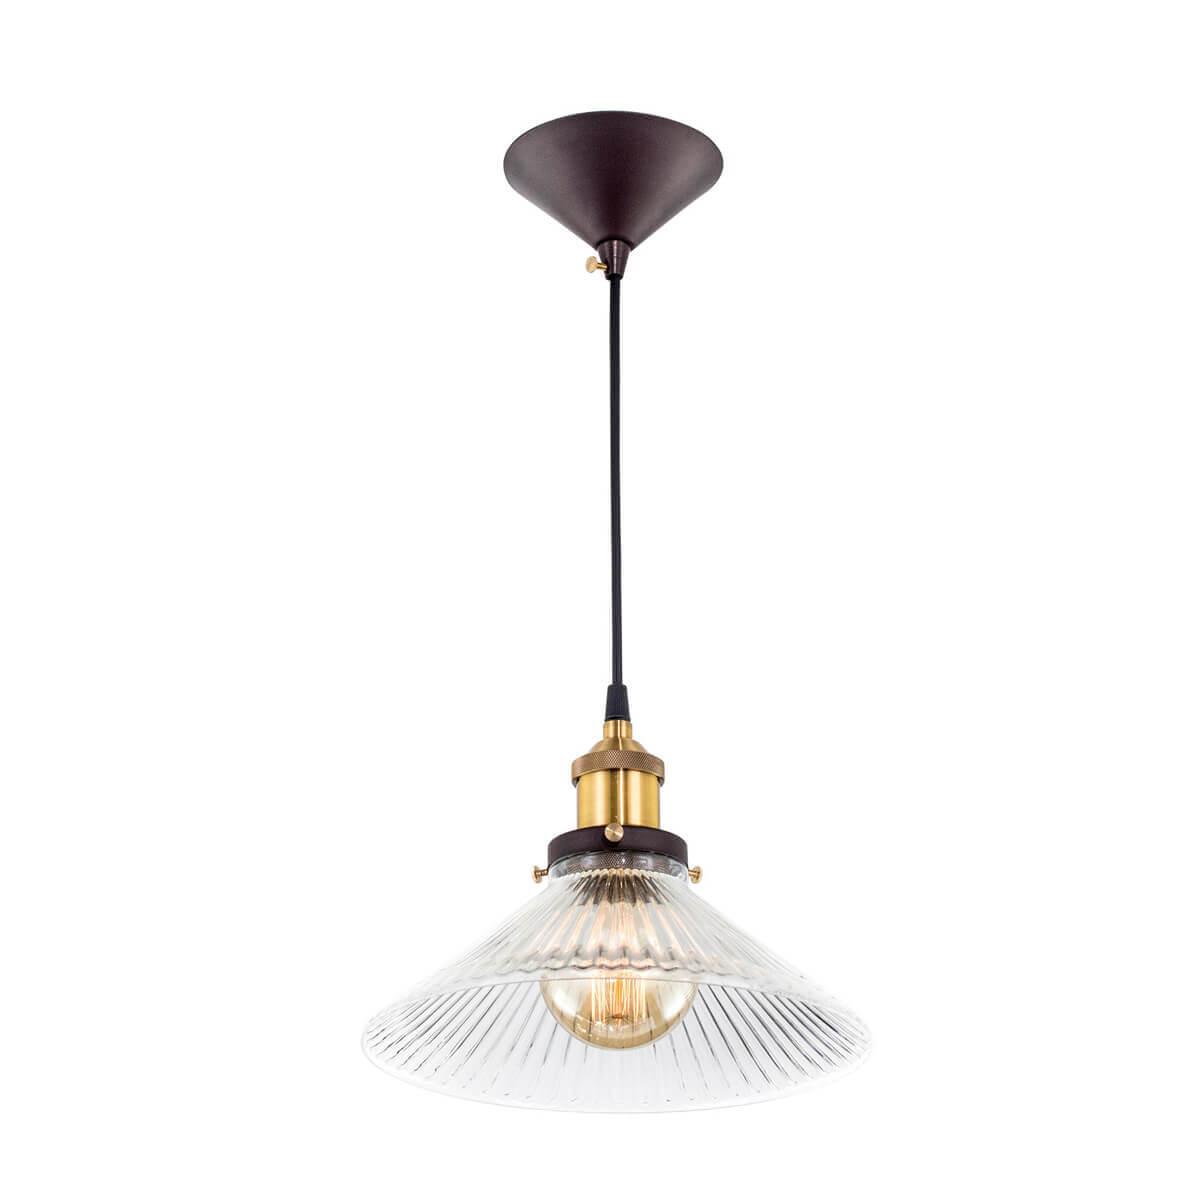 цена на Светильник Citilux CL450106 Эдисон